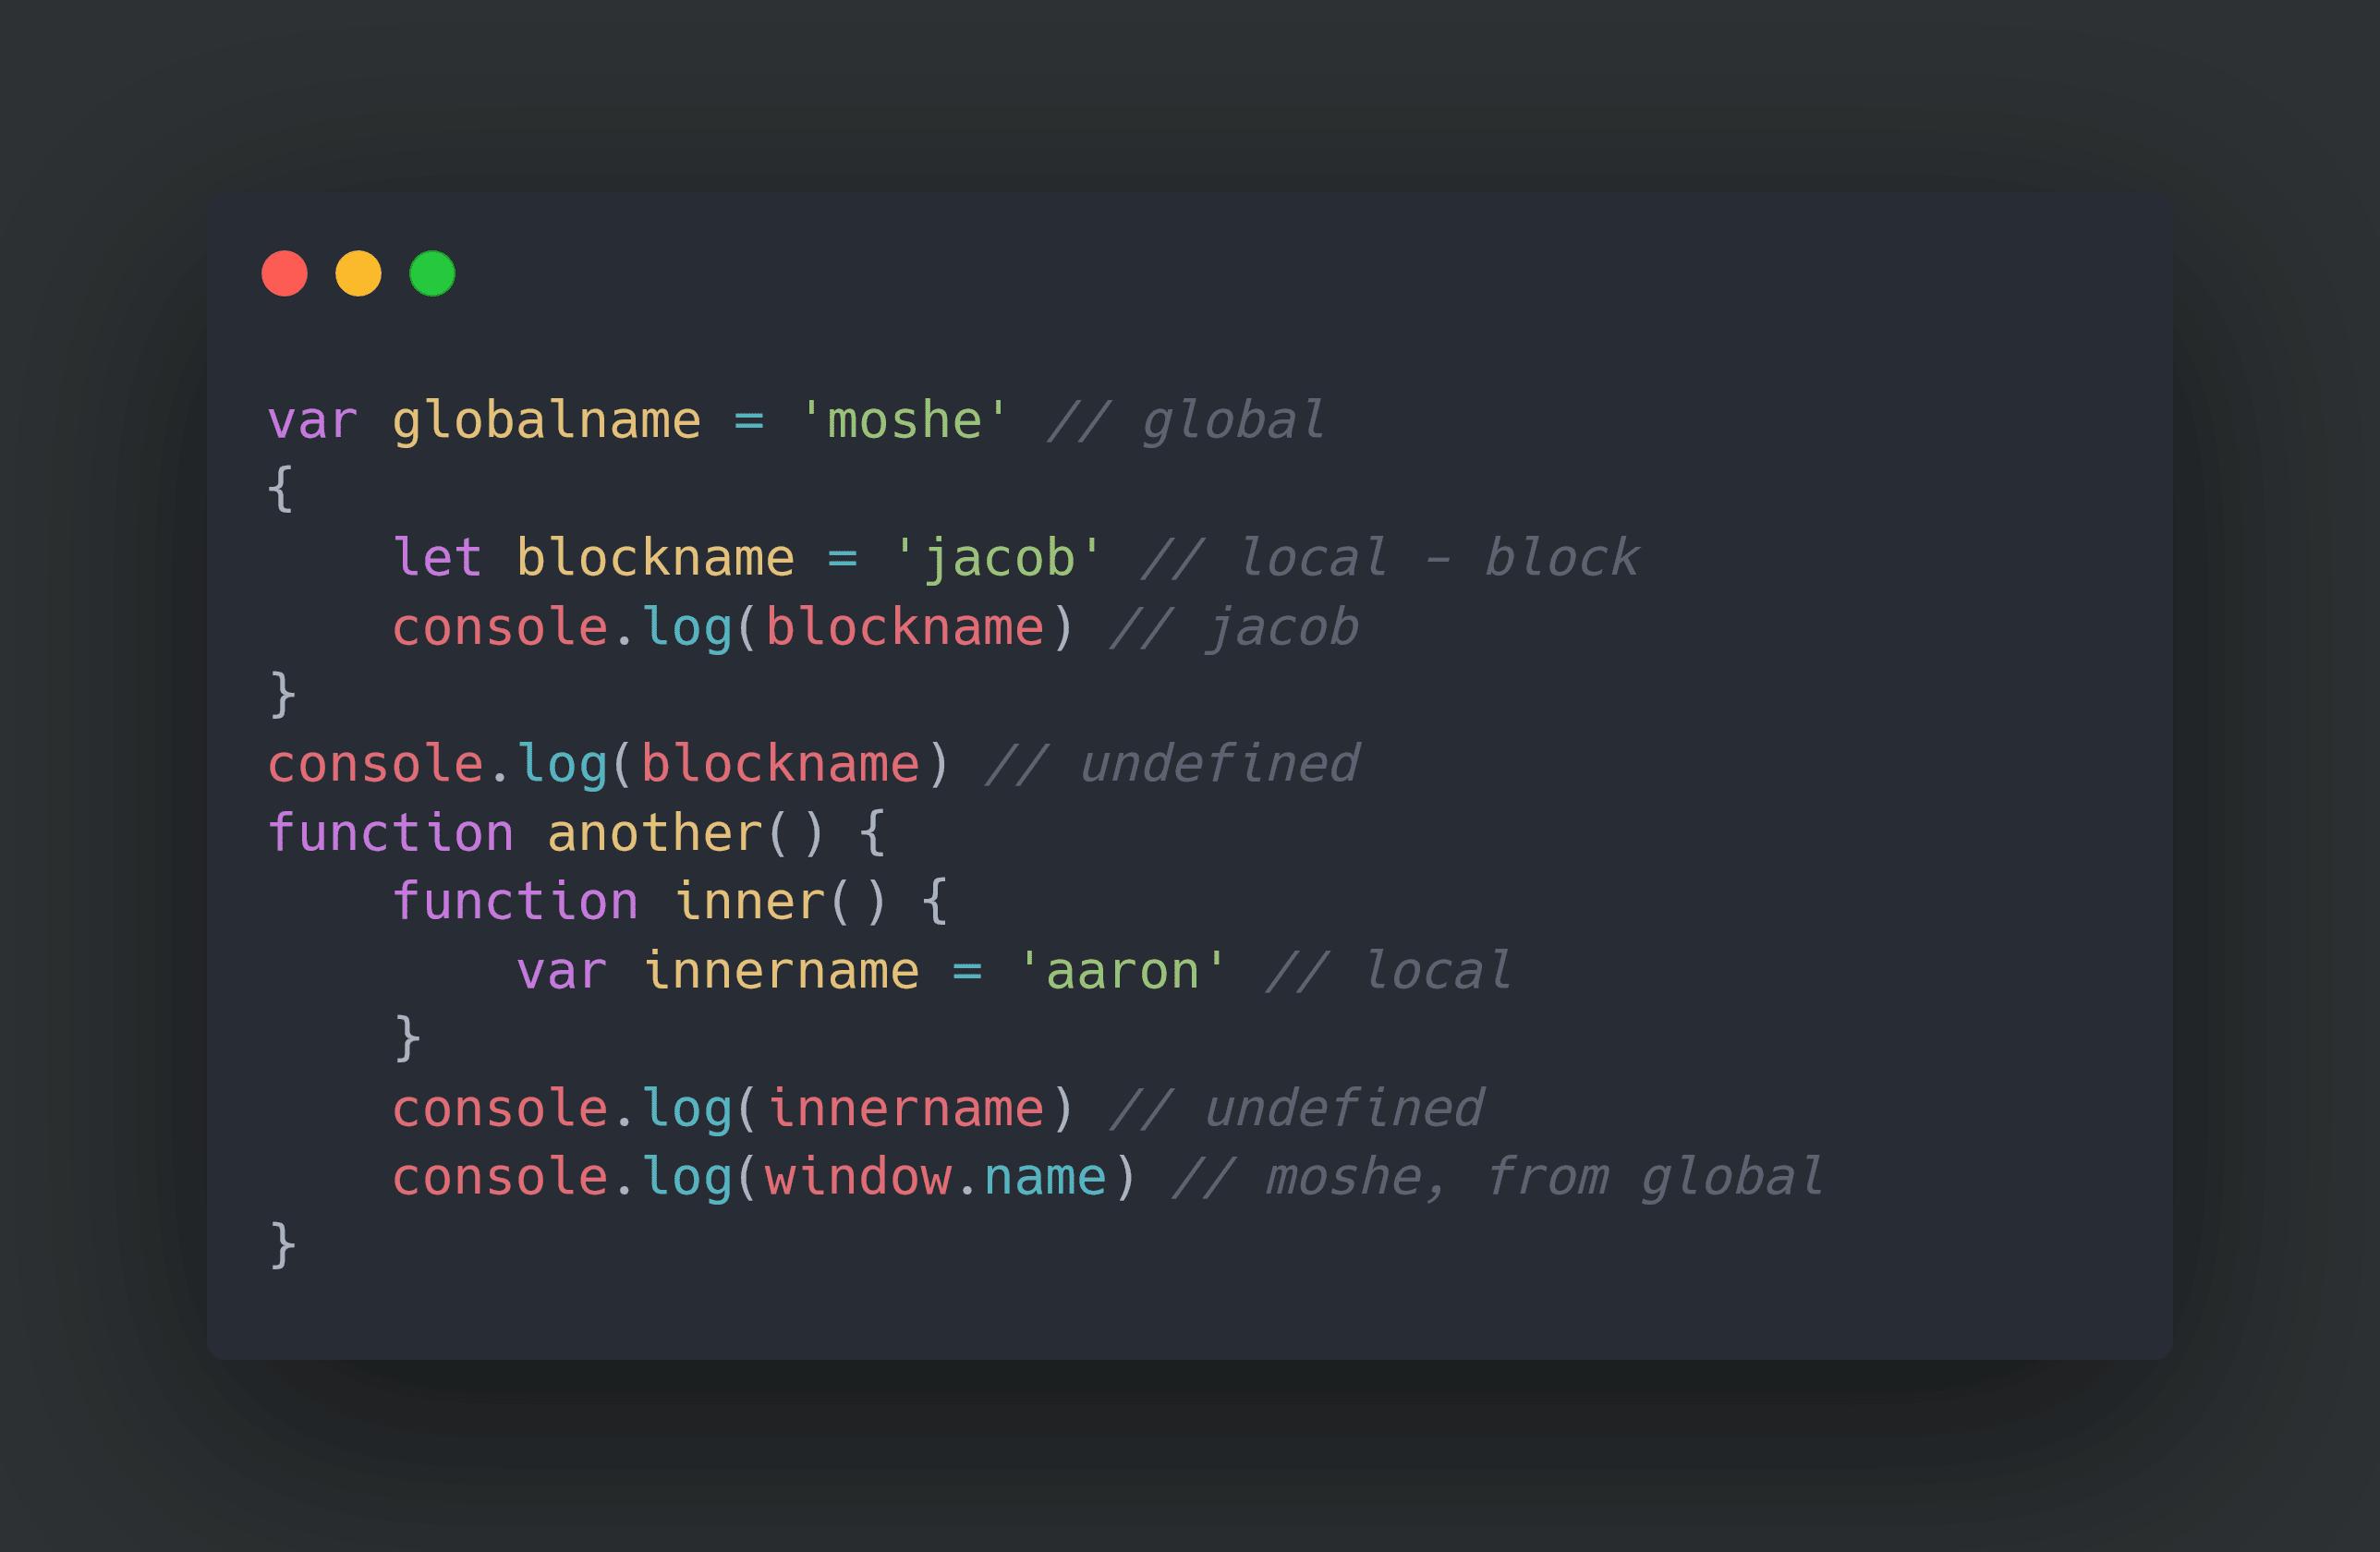 מושגים בסיסיים ב-JS: סְקוֹפּ Scope